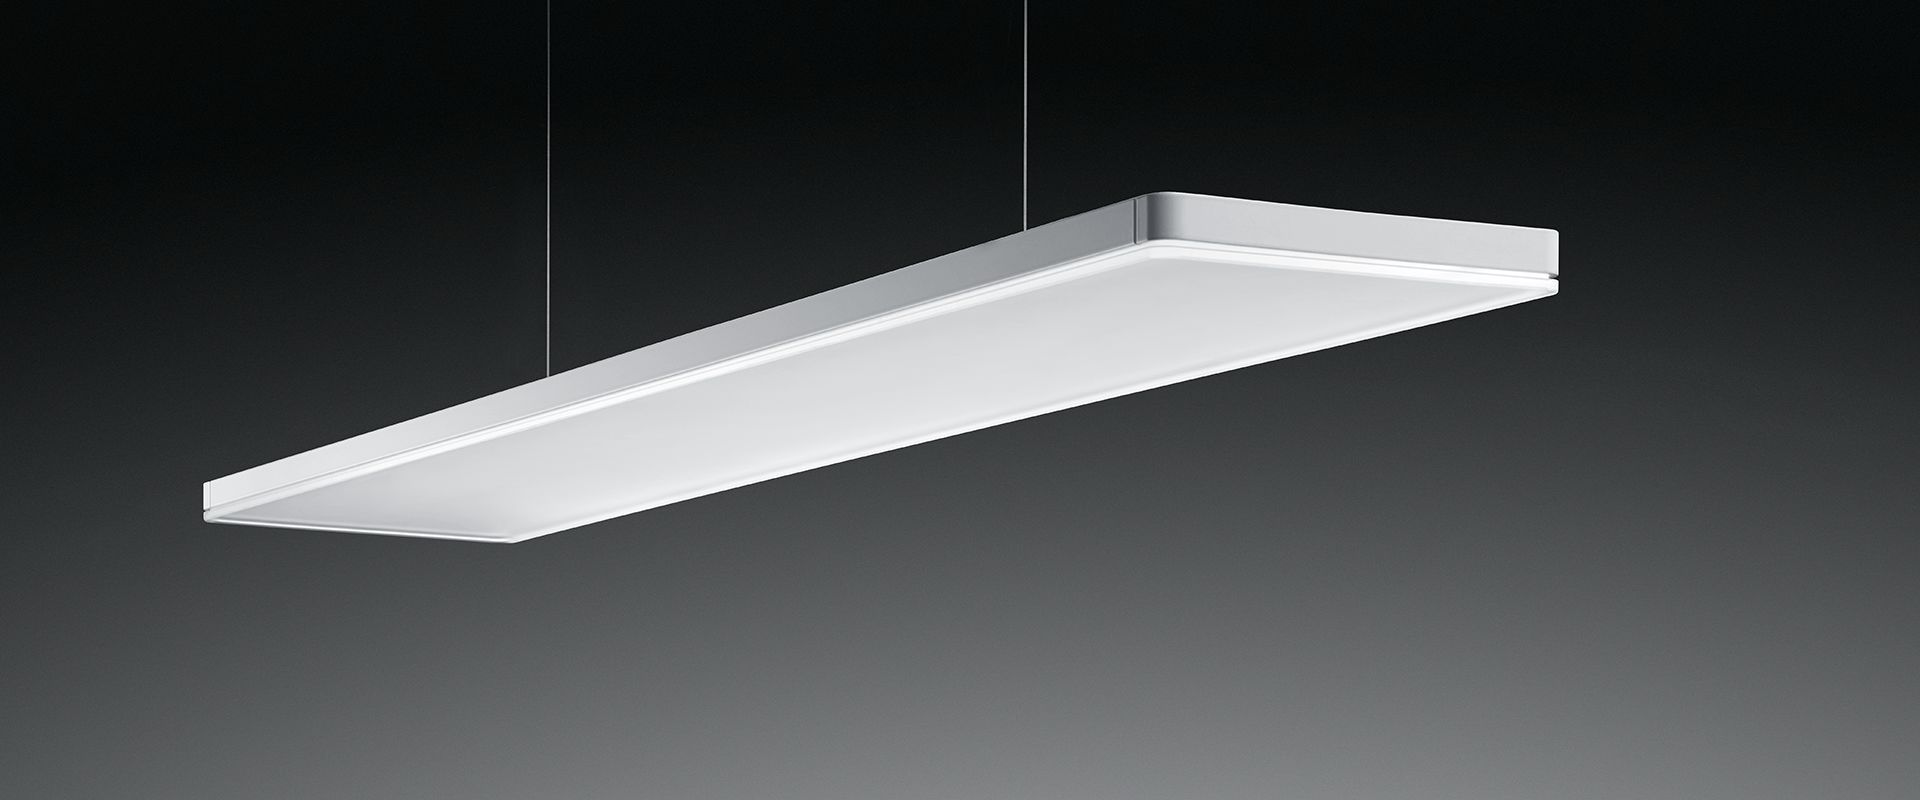 trilux siella lichtert te luminaria g3 m84 ota22 3400. Black Bedroom Furniture Sets. Home Design Ideas